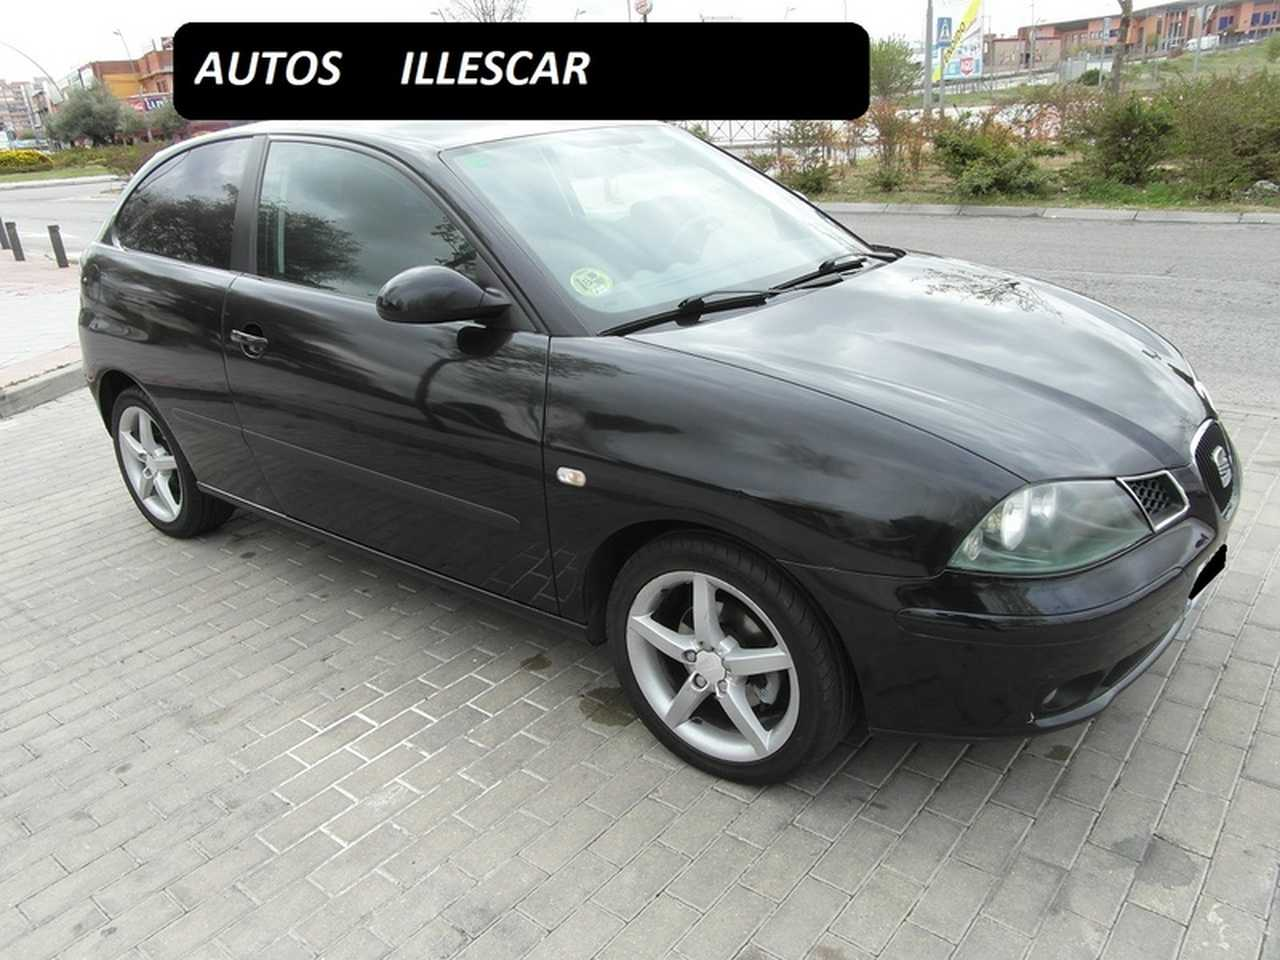 Seat Ibiza 1.4 I   100 CV MEJOR VER  - Foto 1